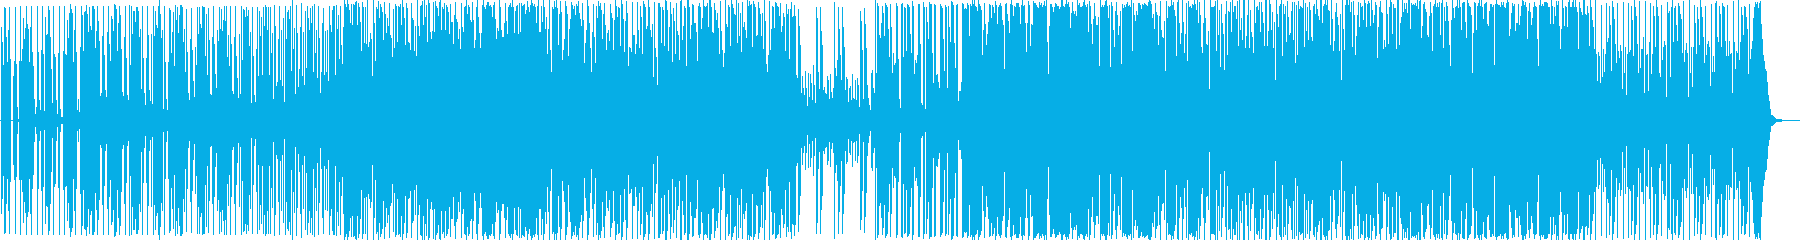 POODLESの再生済みの波形